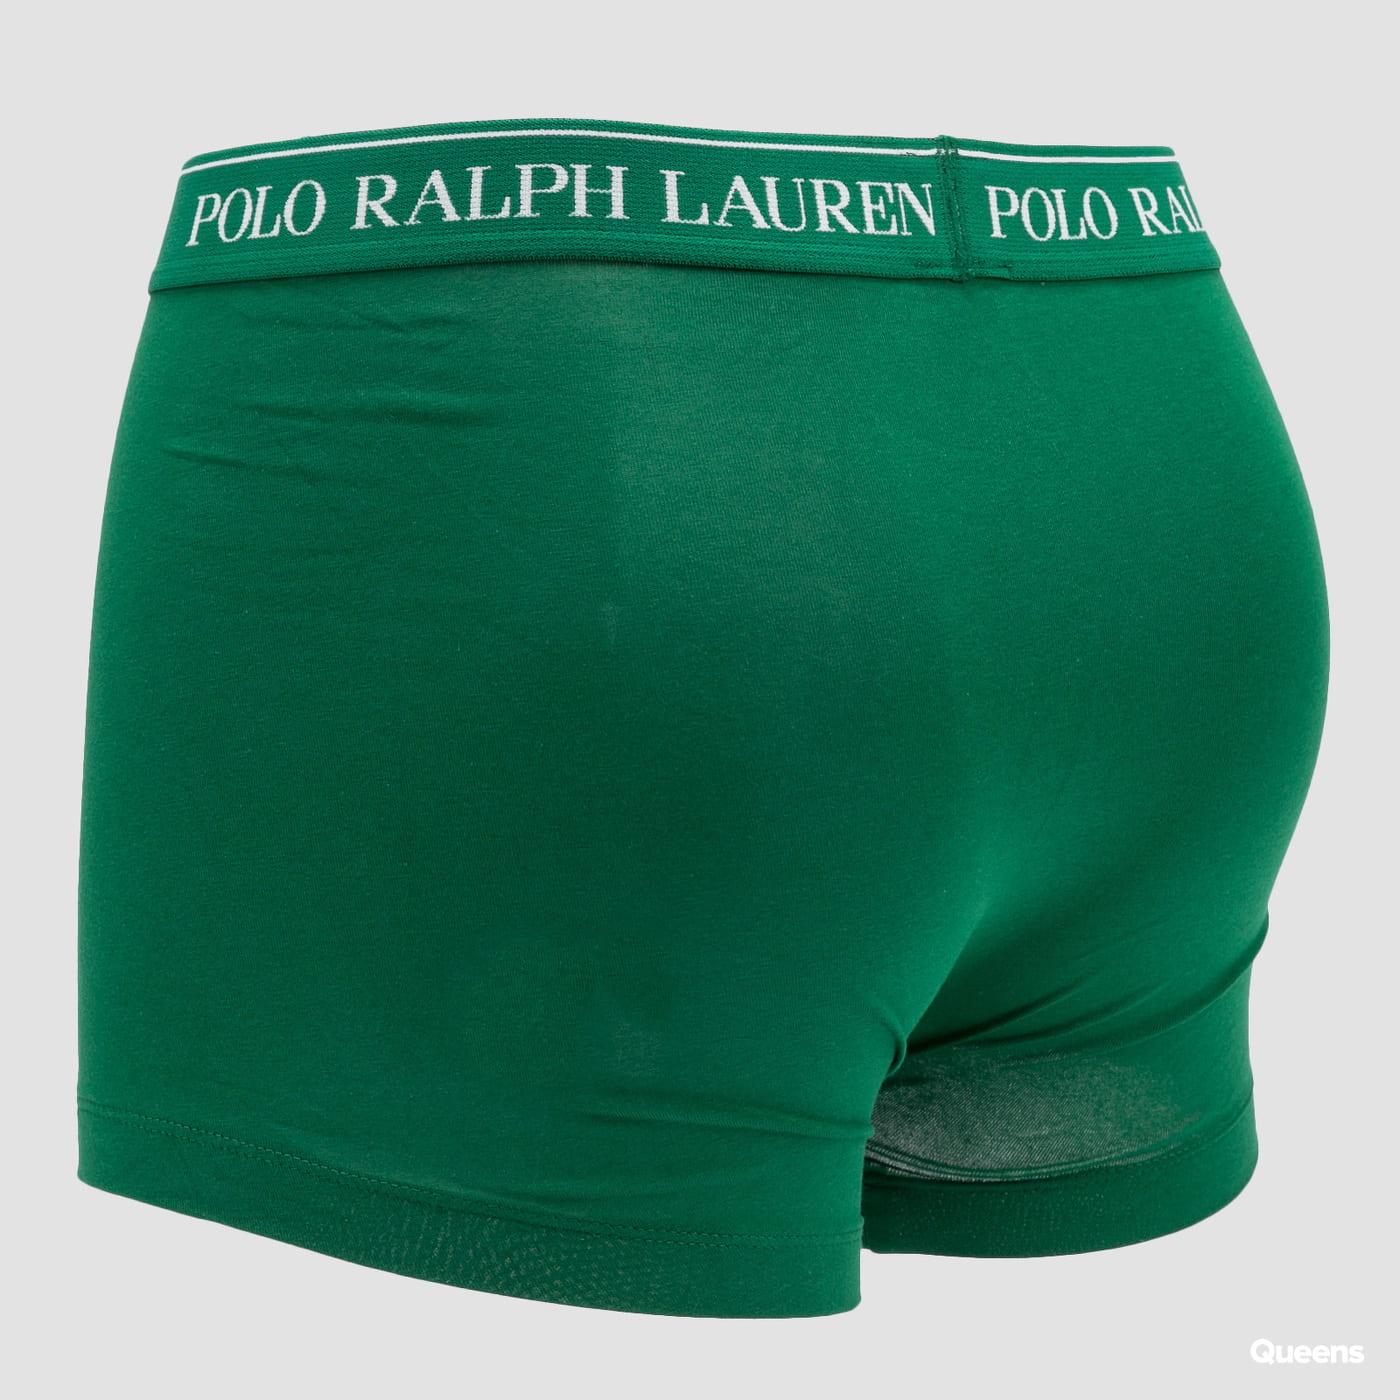 Polo Ralph Lauren 3Pack Stretch Cotton Classic Trunks černé / zelené / navy